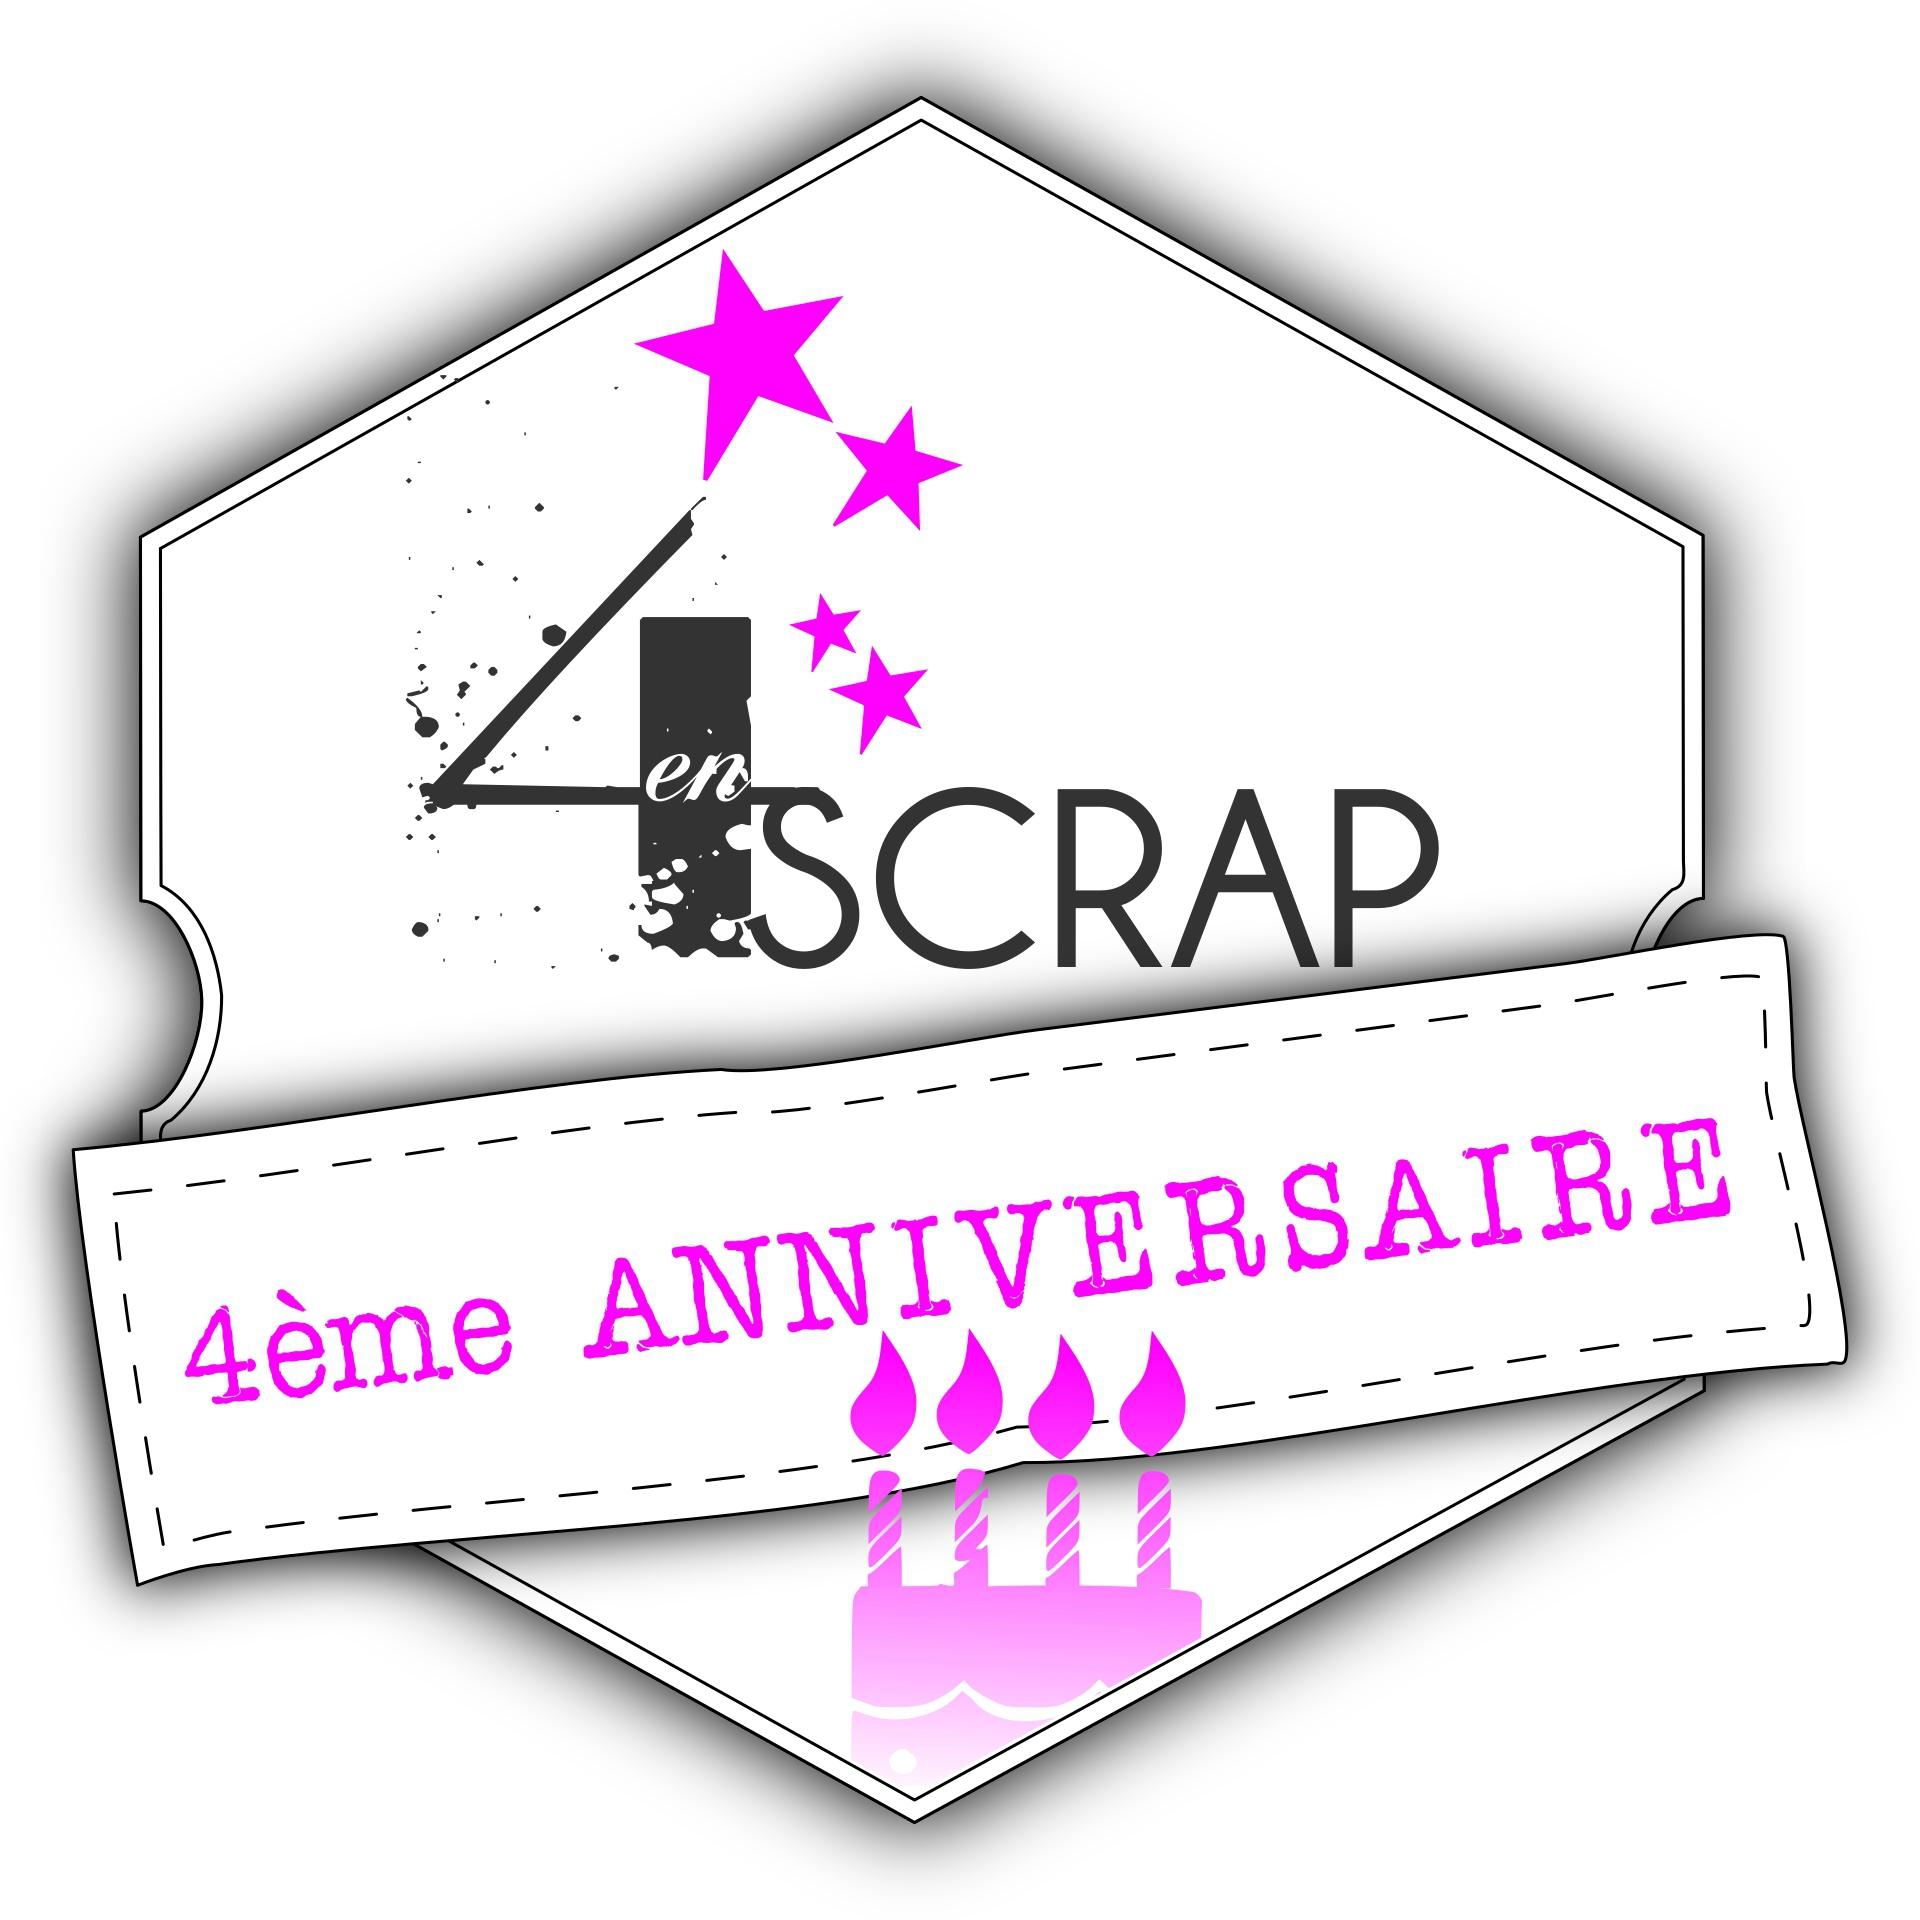 4enscrap 4eme anniversaire logo